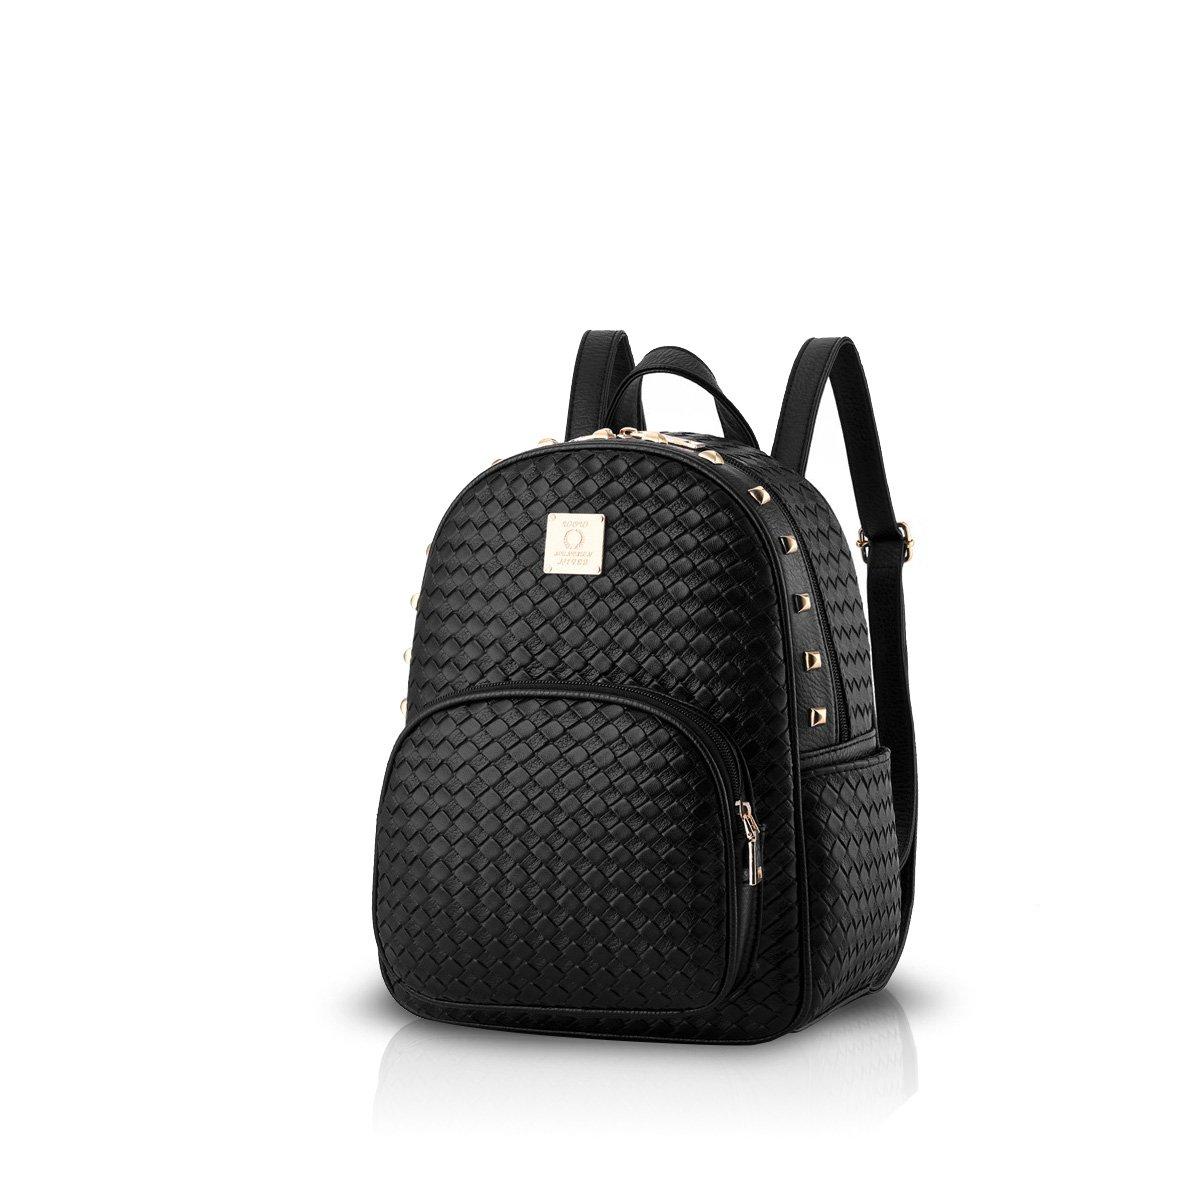 NICOLE & DORIS New Women Backpack Travel ladies Backpack Shoulder Bag PU Leather Fashion college backpack Black